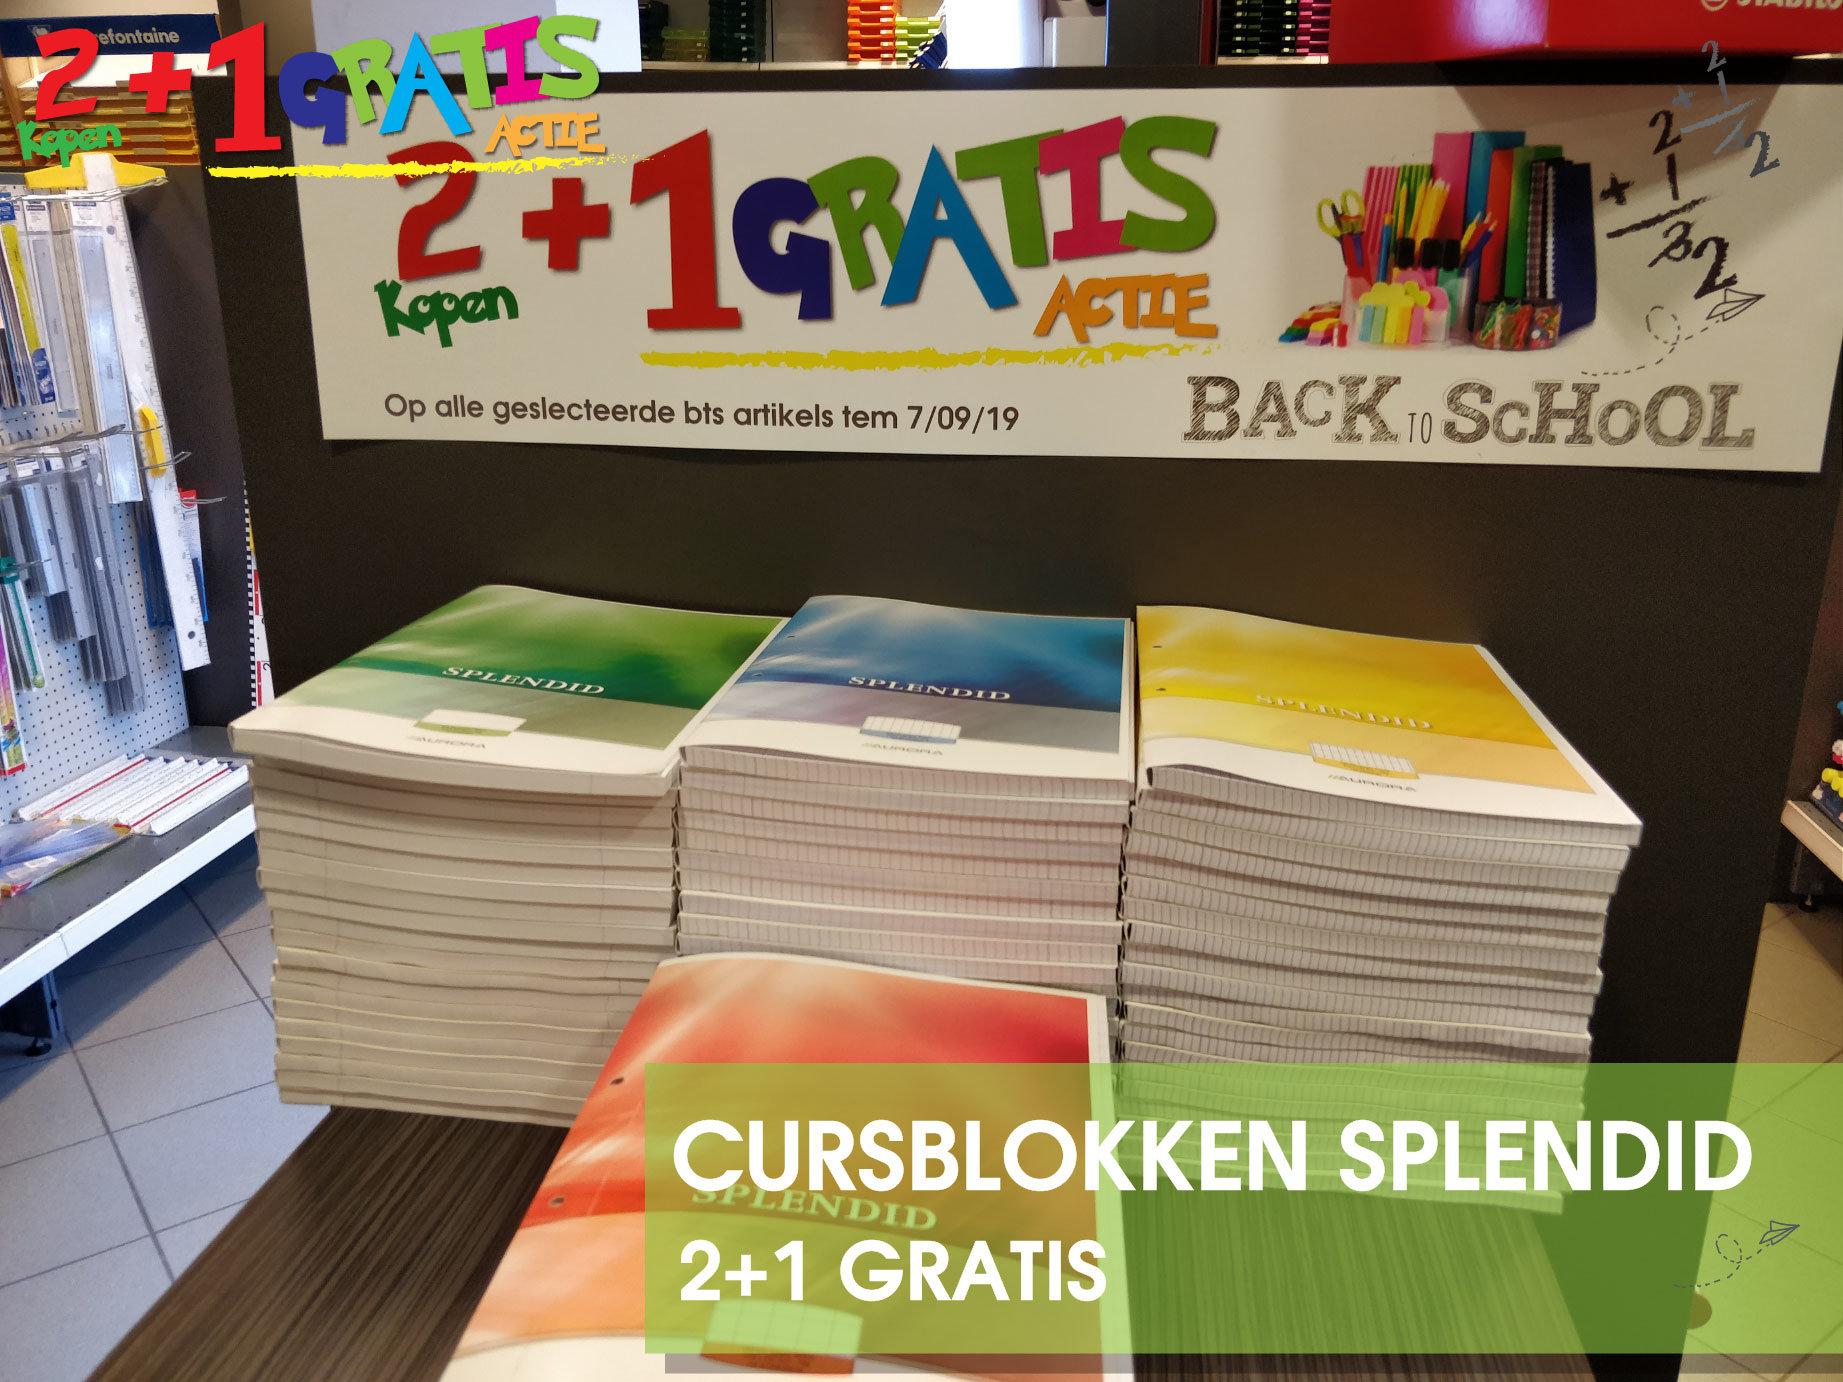 Marcelis-School-materiaal-splendid-cursusblok-promo-2+1-gratis-actie